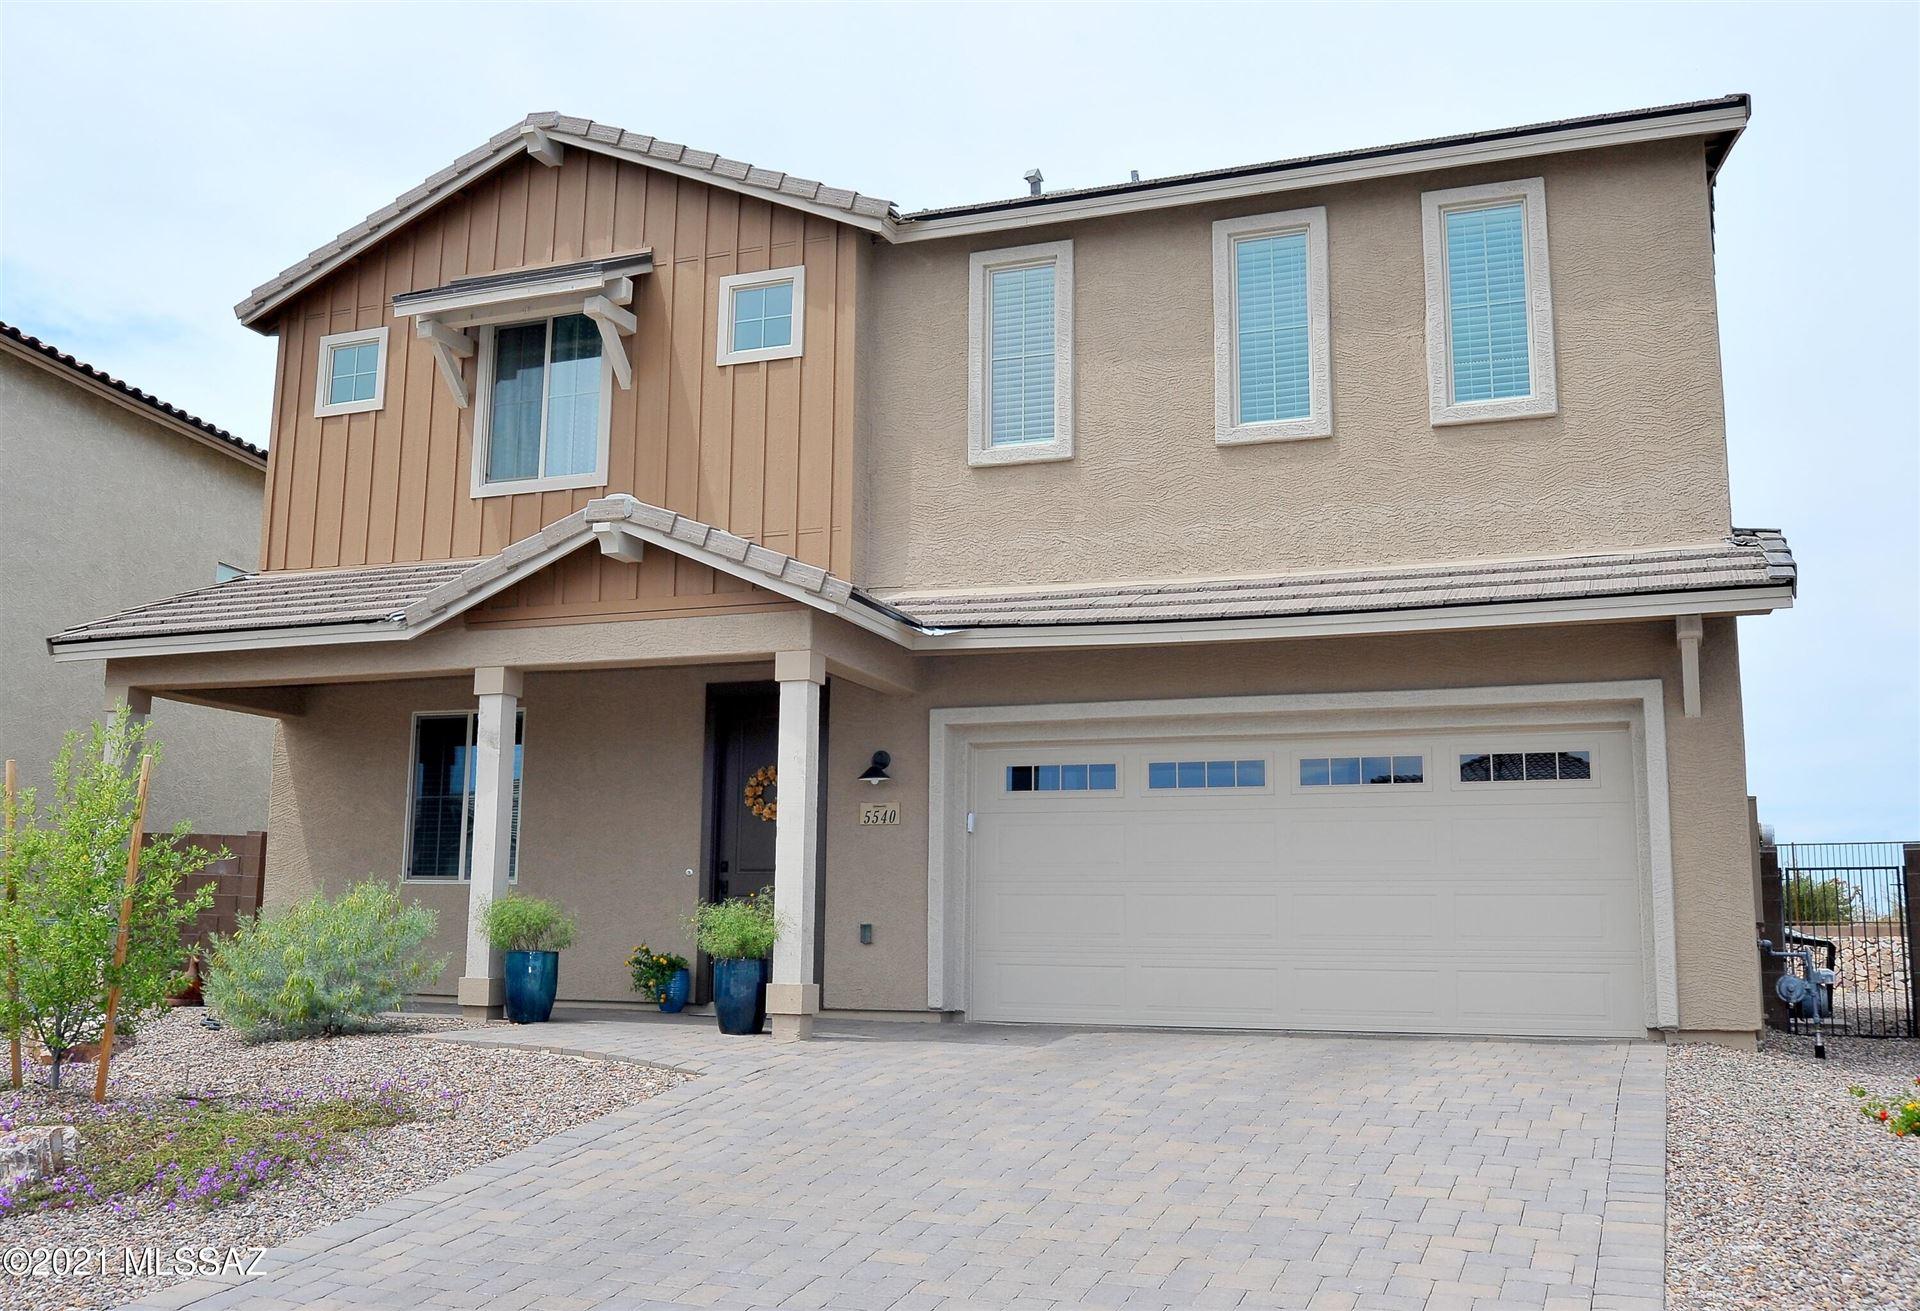 5540 S Saguaro Wash Trail, Tucson, AZ 85747 - MLS#: 22111722